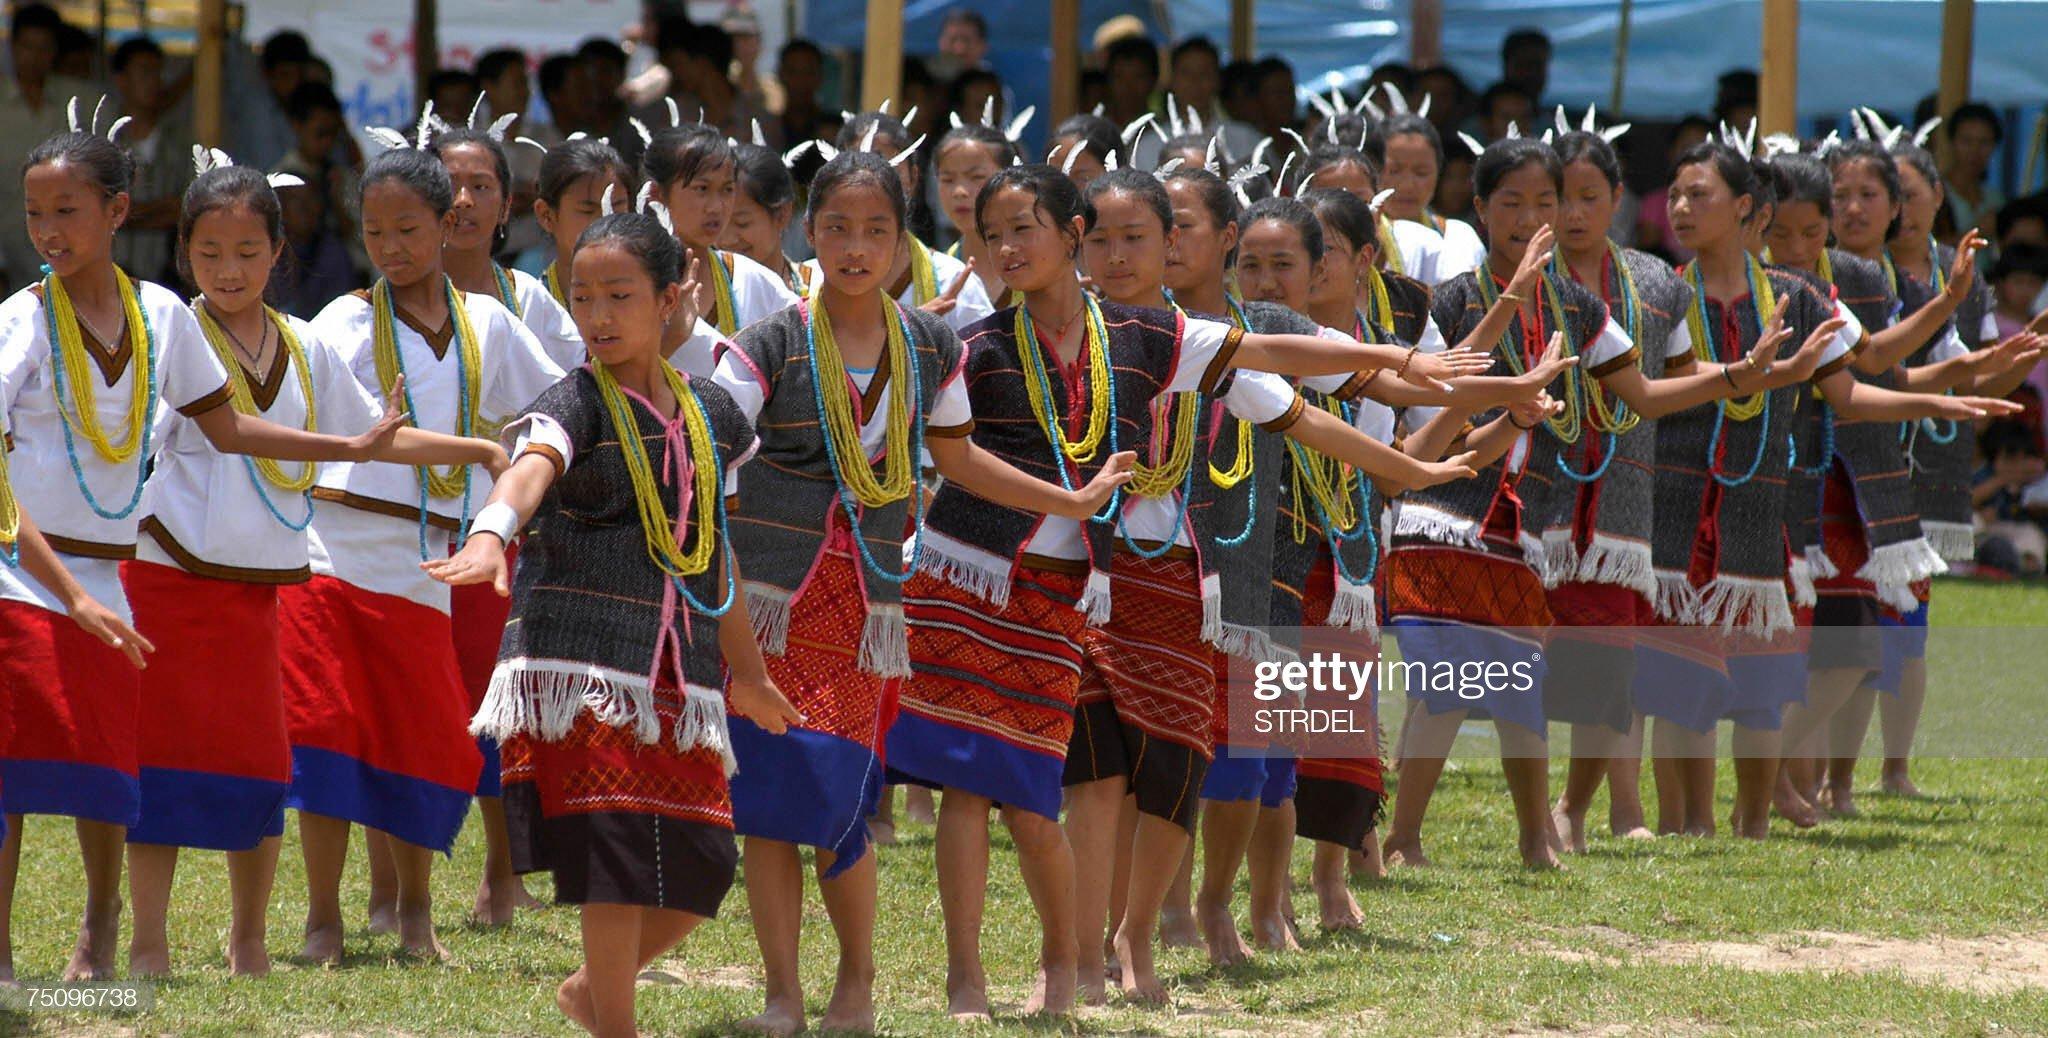 Young women from the Arunachal Pradesh t... : News Photo